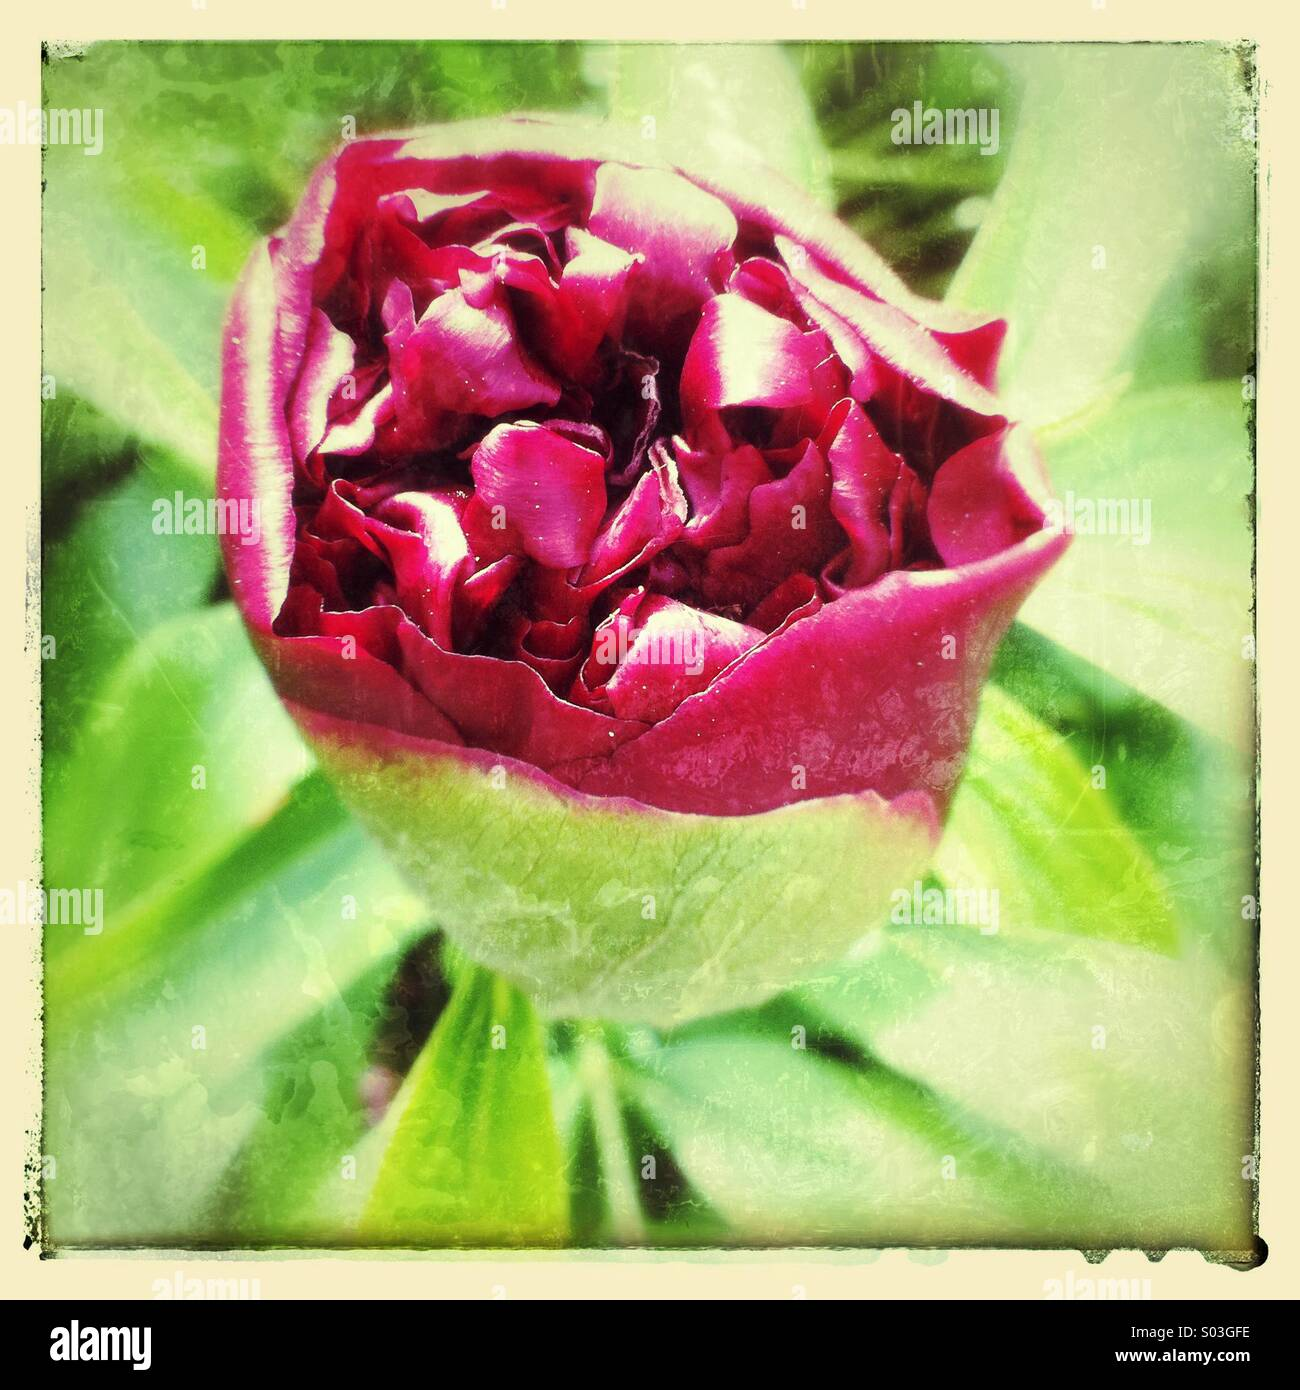 Peony flower bud opening - Stock Image